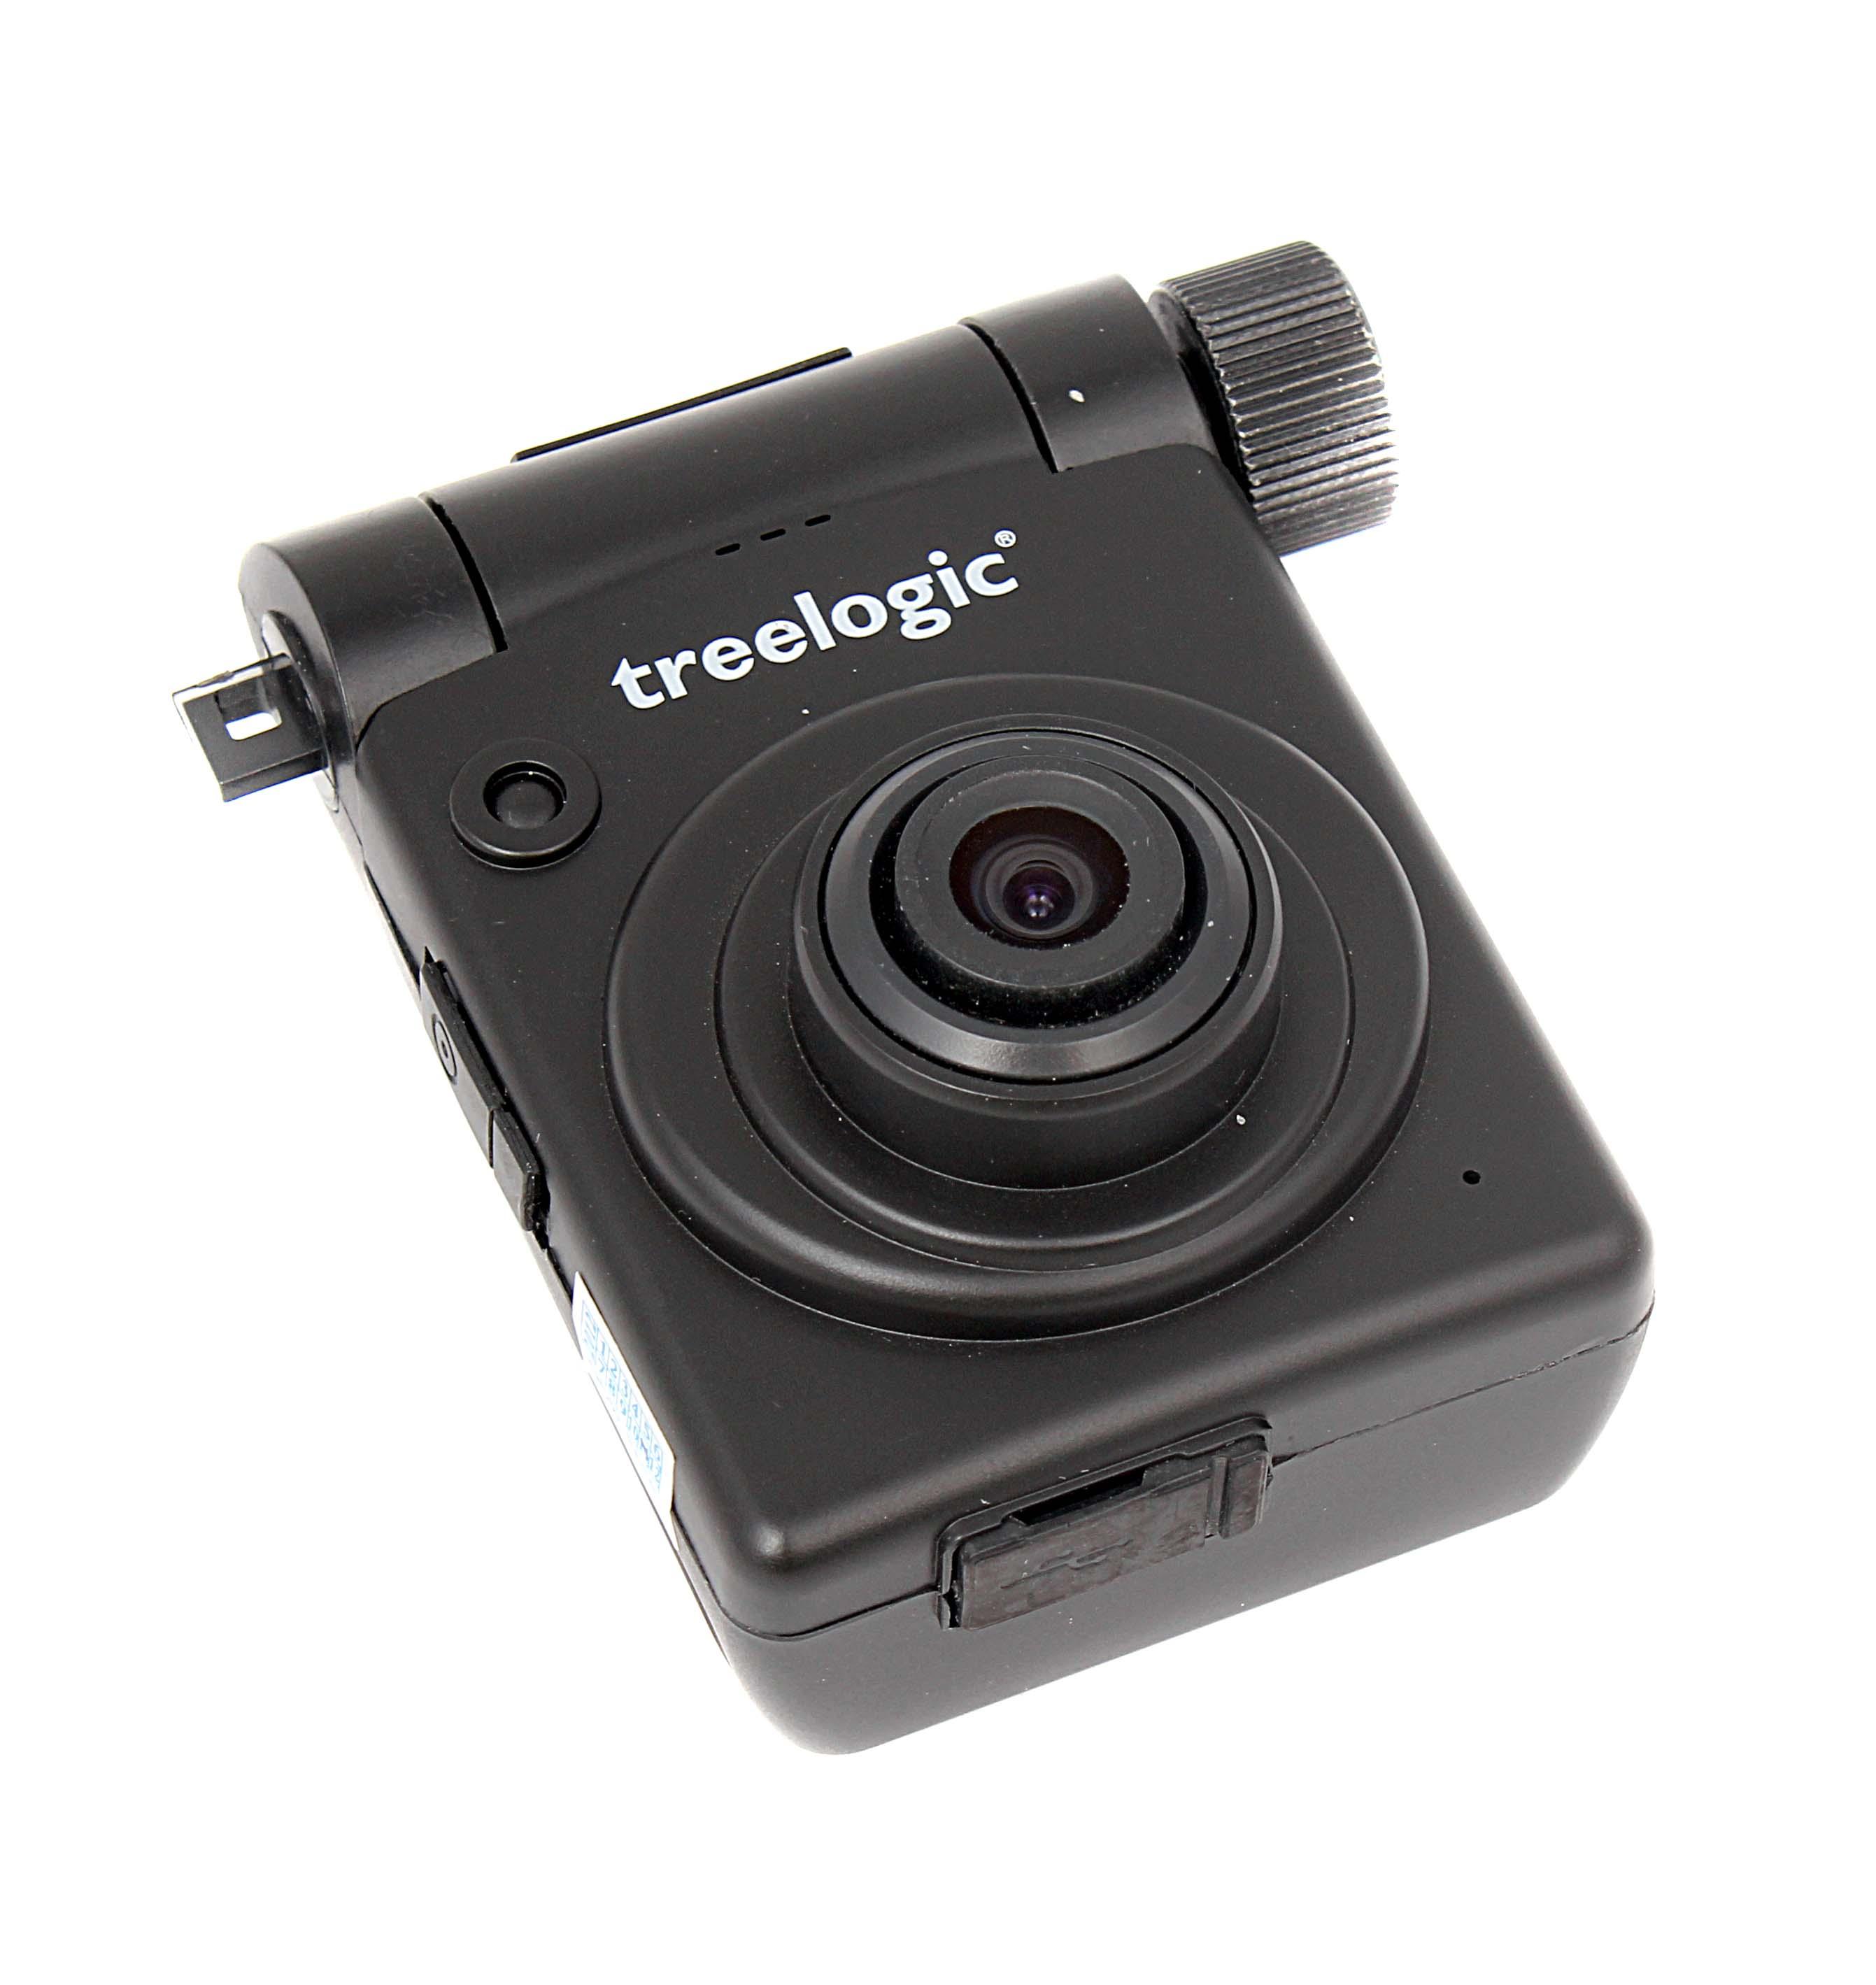 Видеорегистратор Treelogic